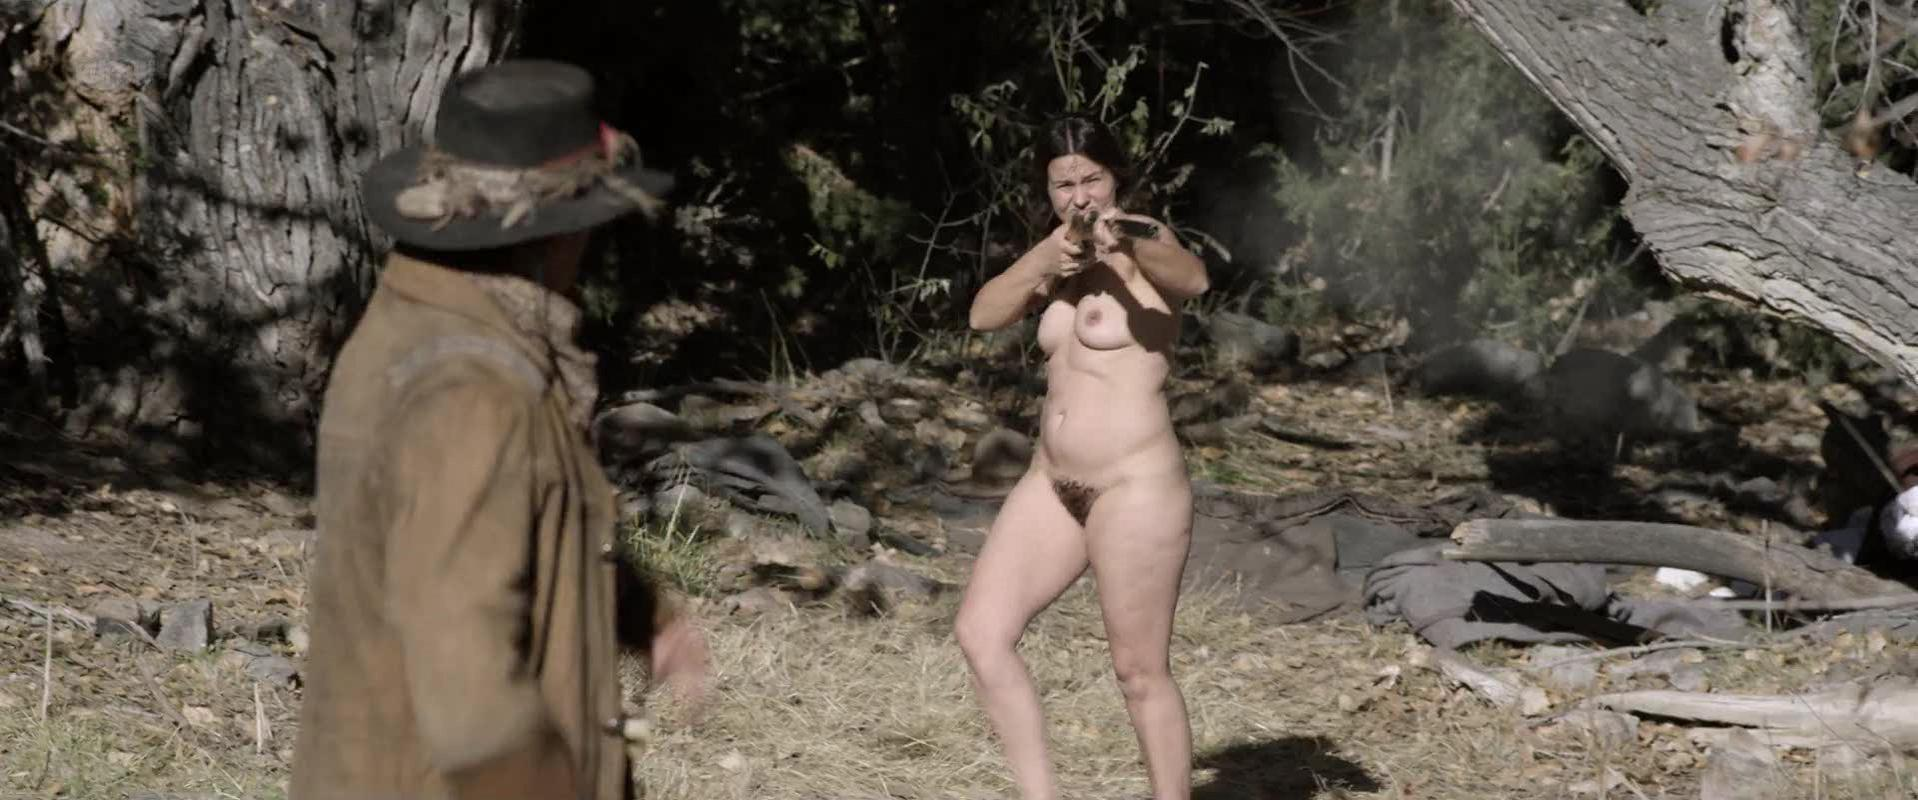 Trine Christensen nude - Godless s01е02 (2017)